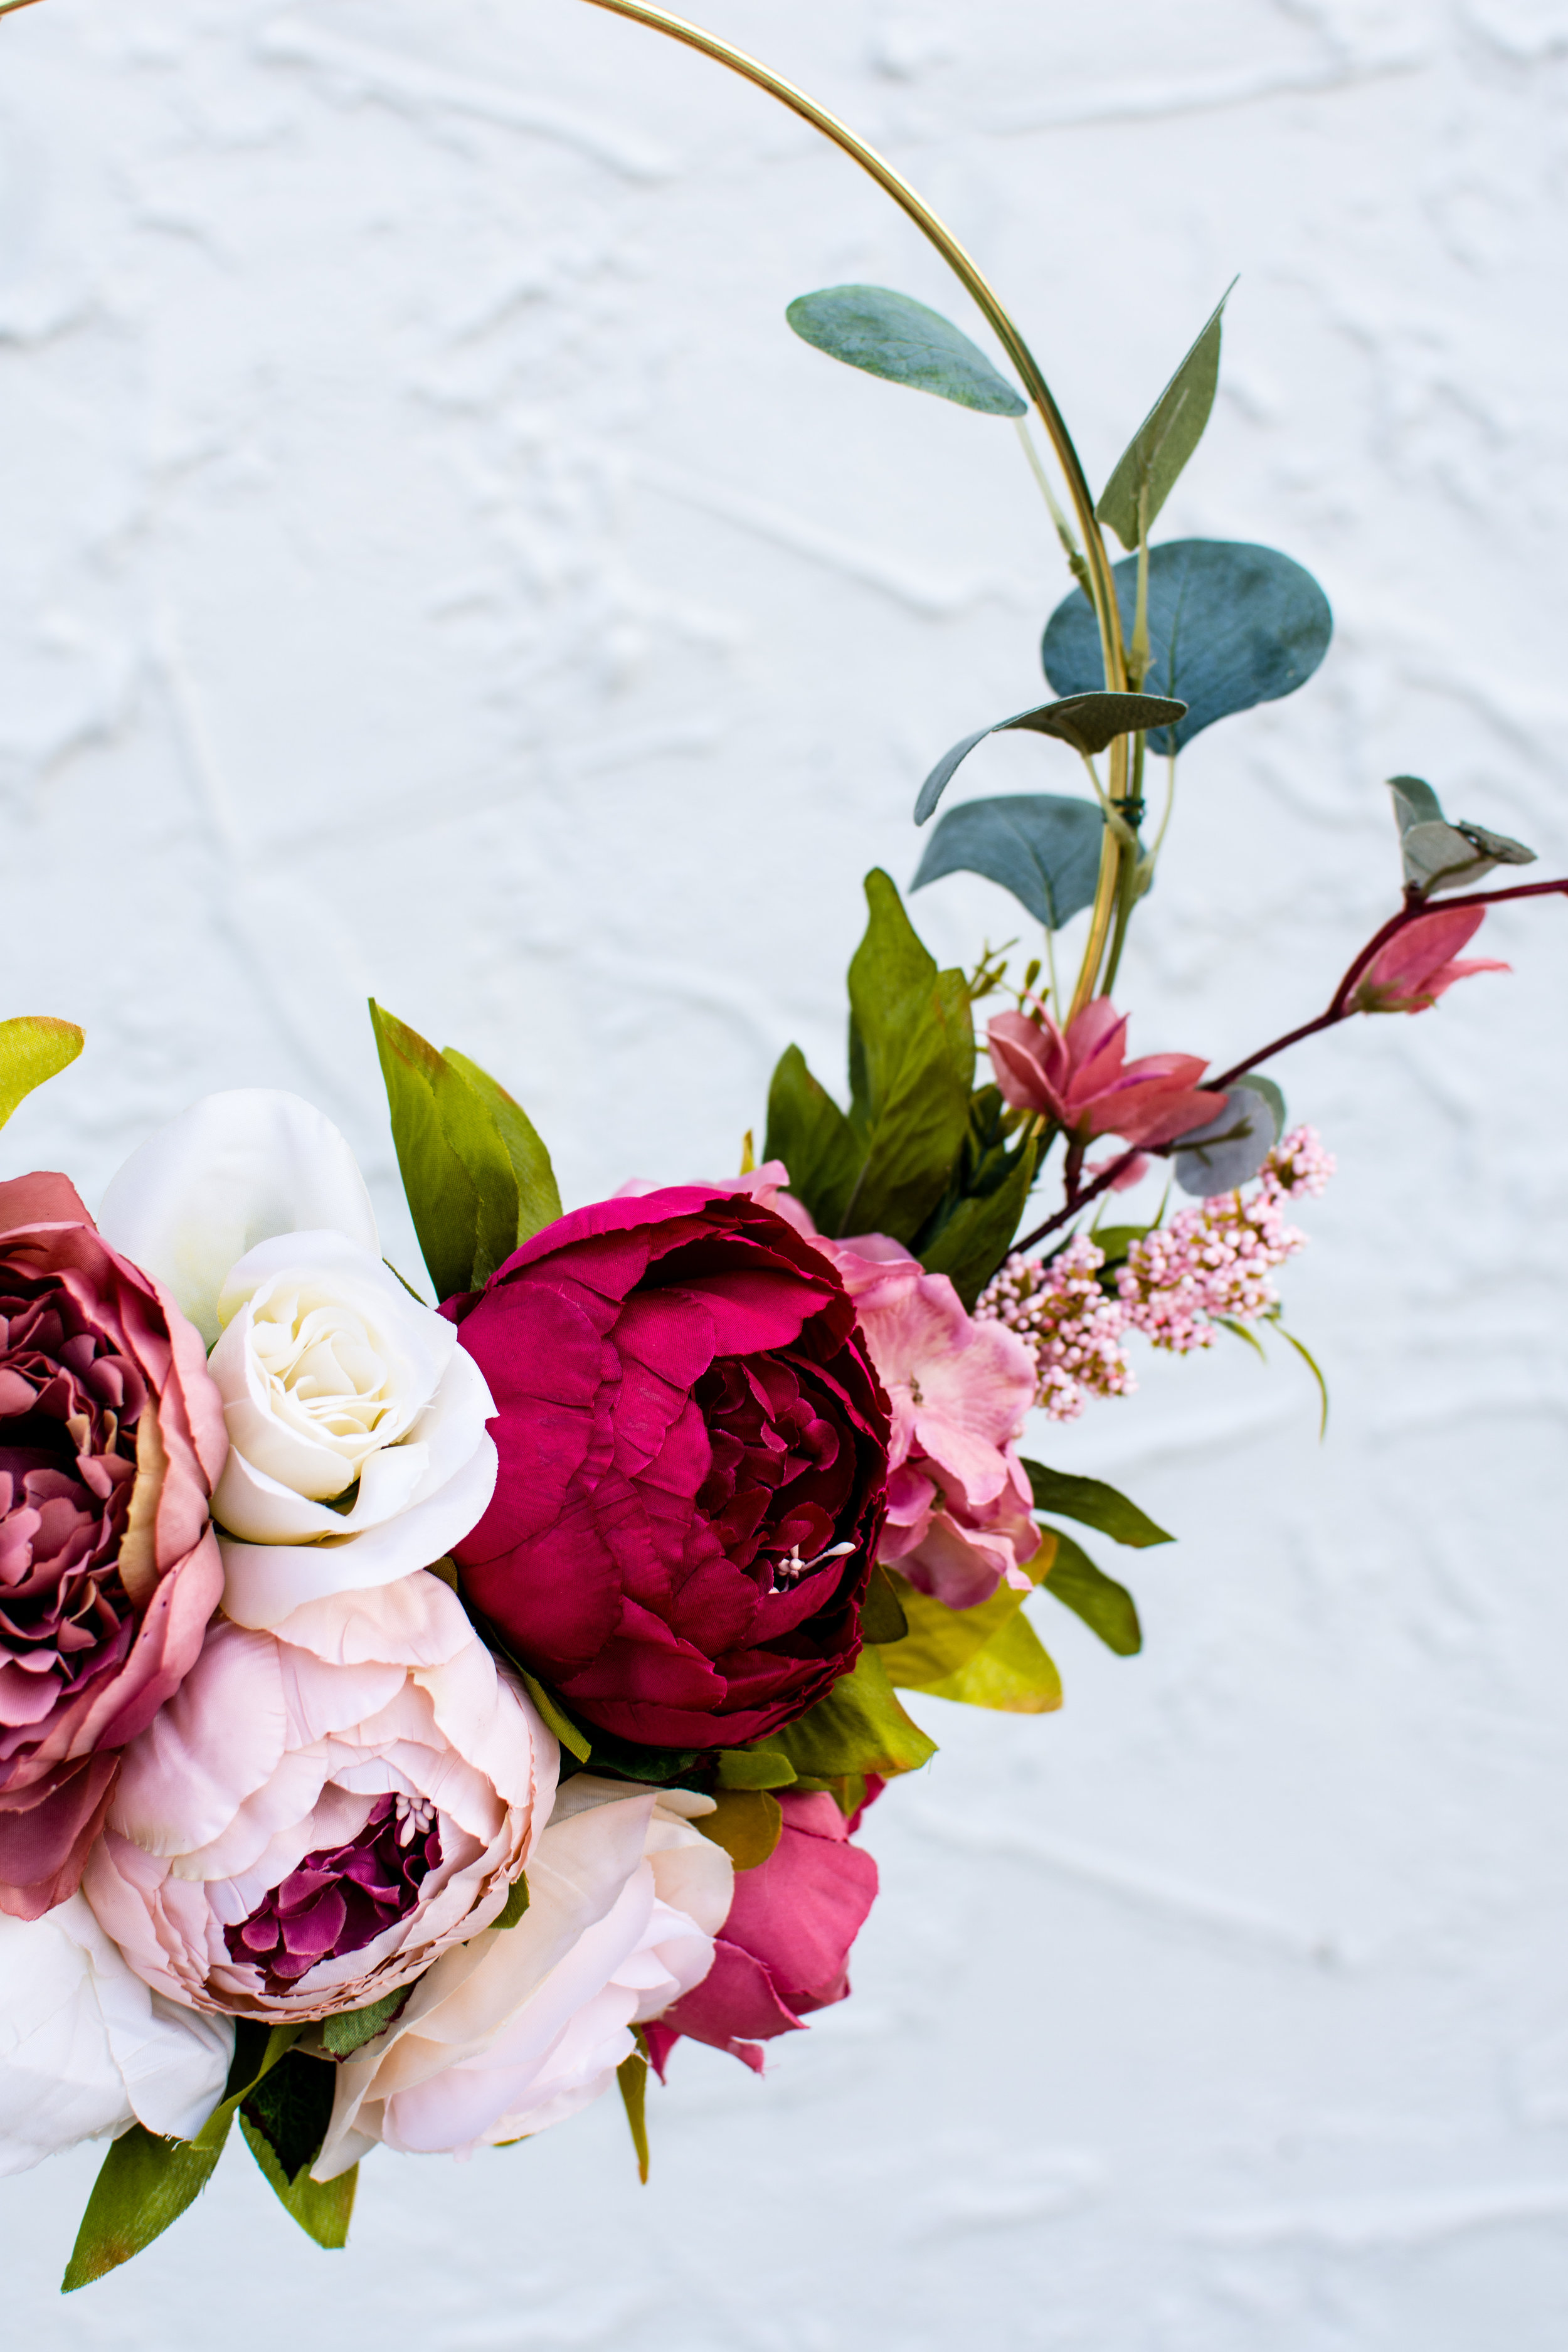 Wedding Hoop Floral Product Photography.jpg